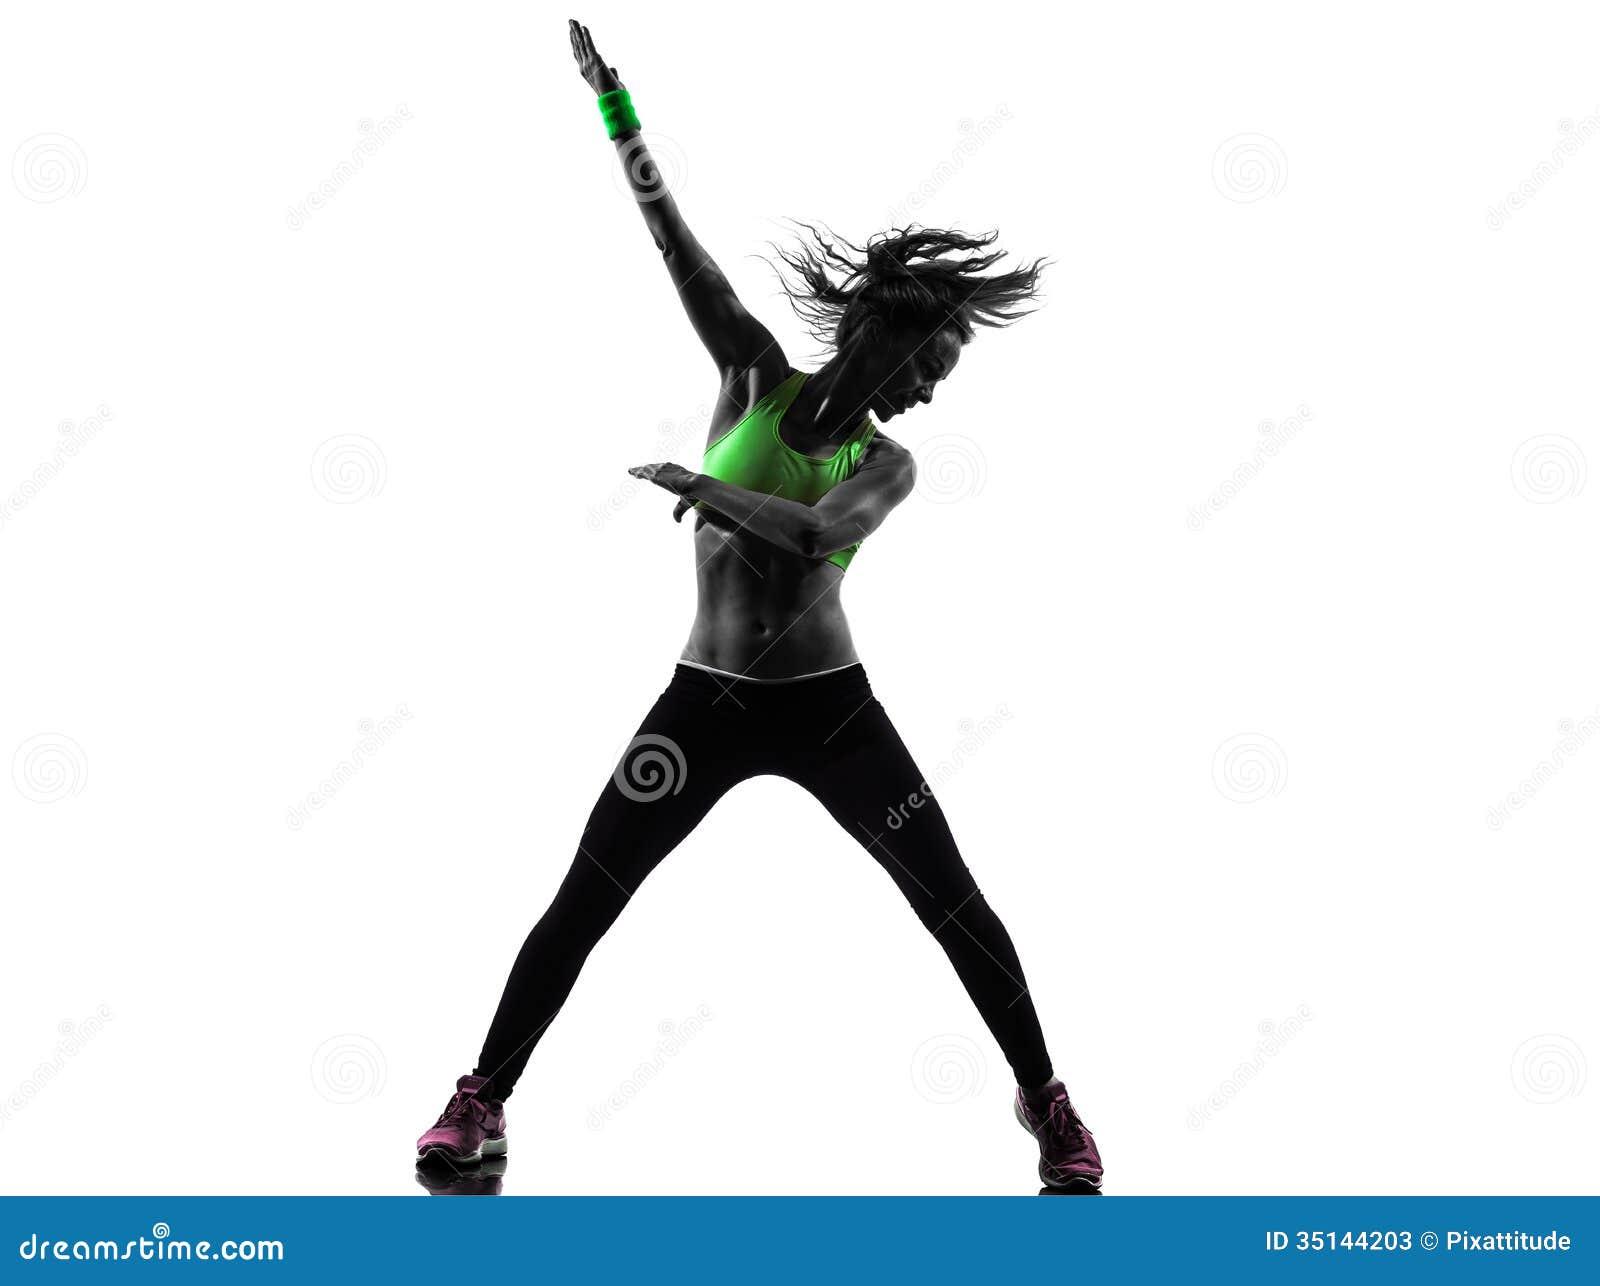 Aerobics dance 3d - 3 1